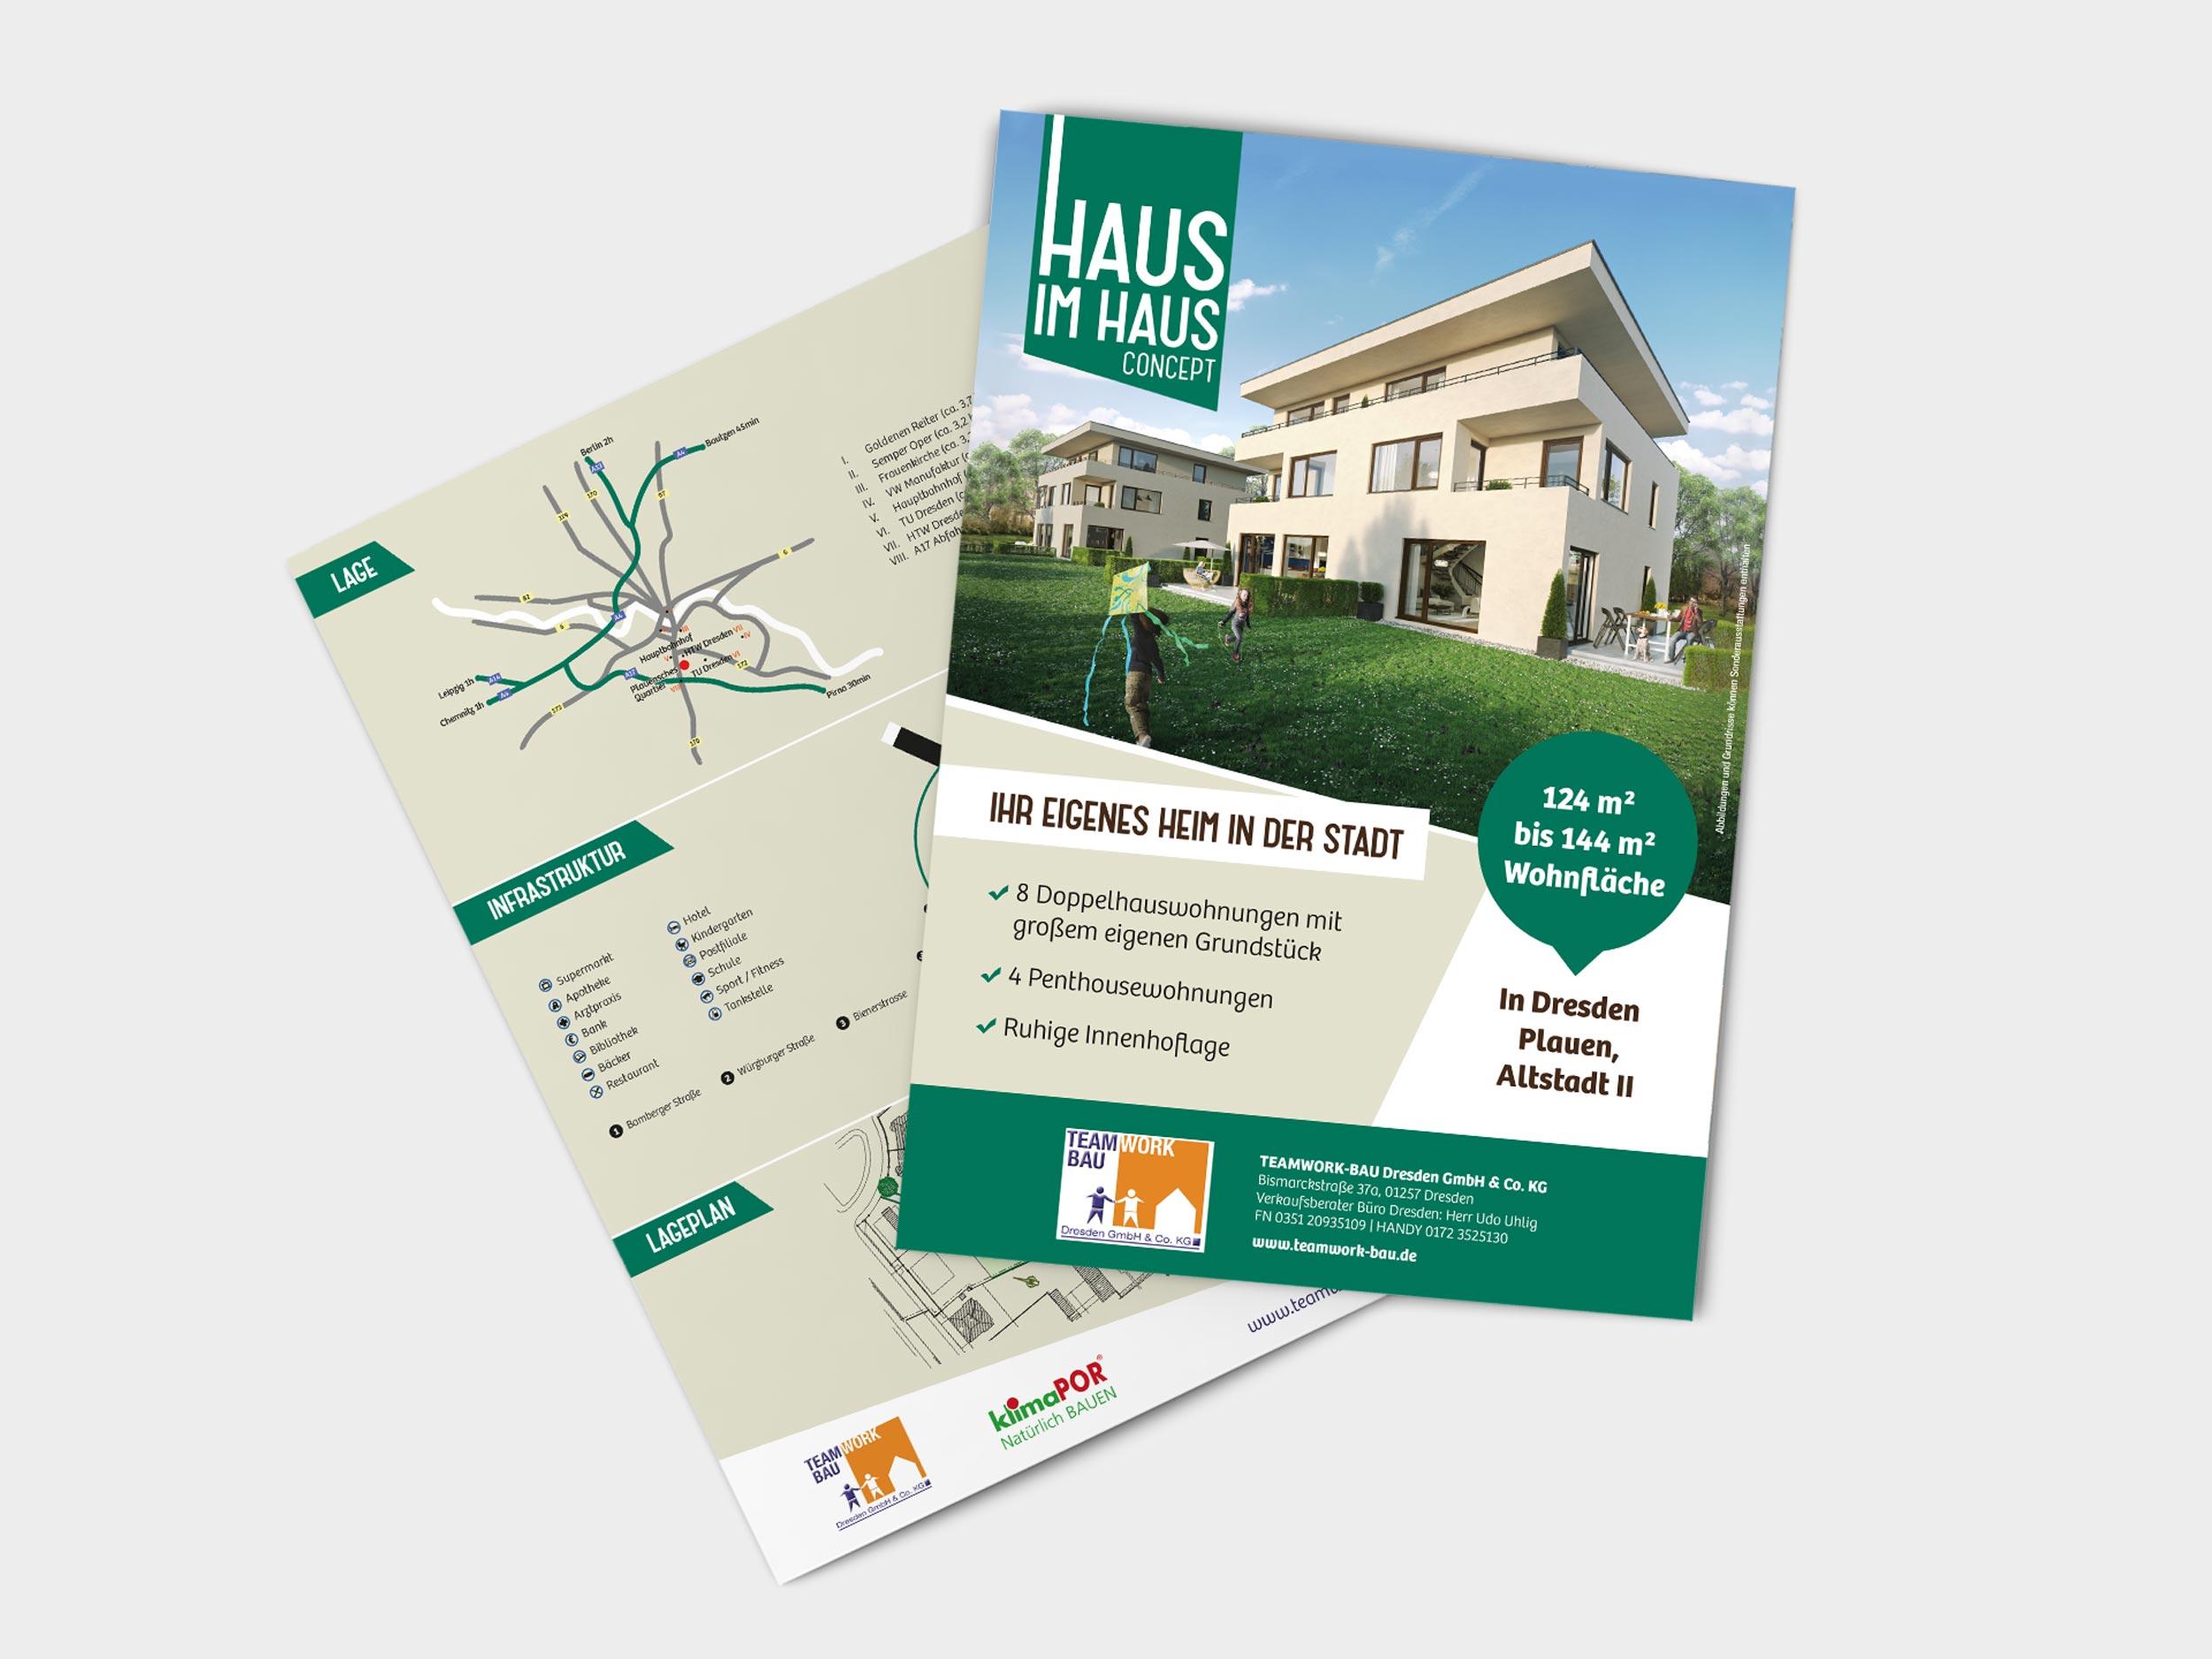 Haus im Haus brochure by GPU Design